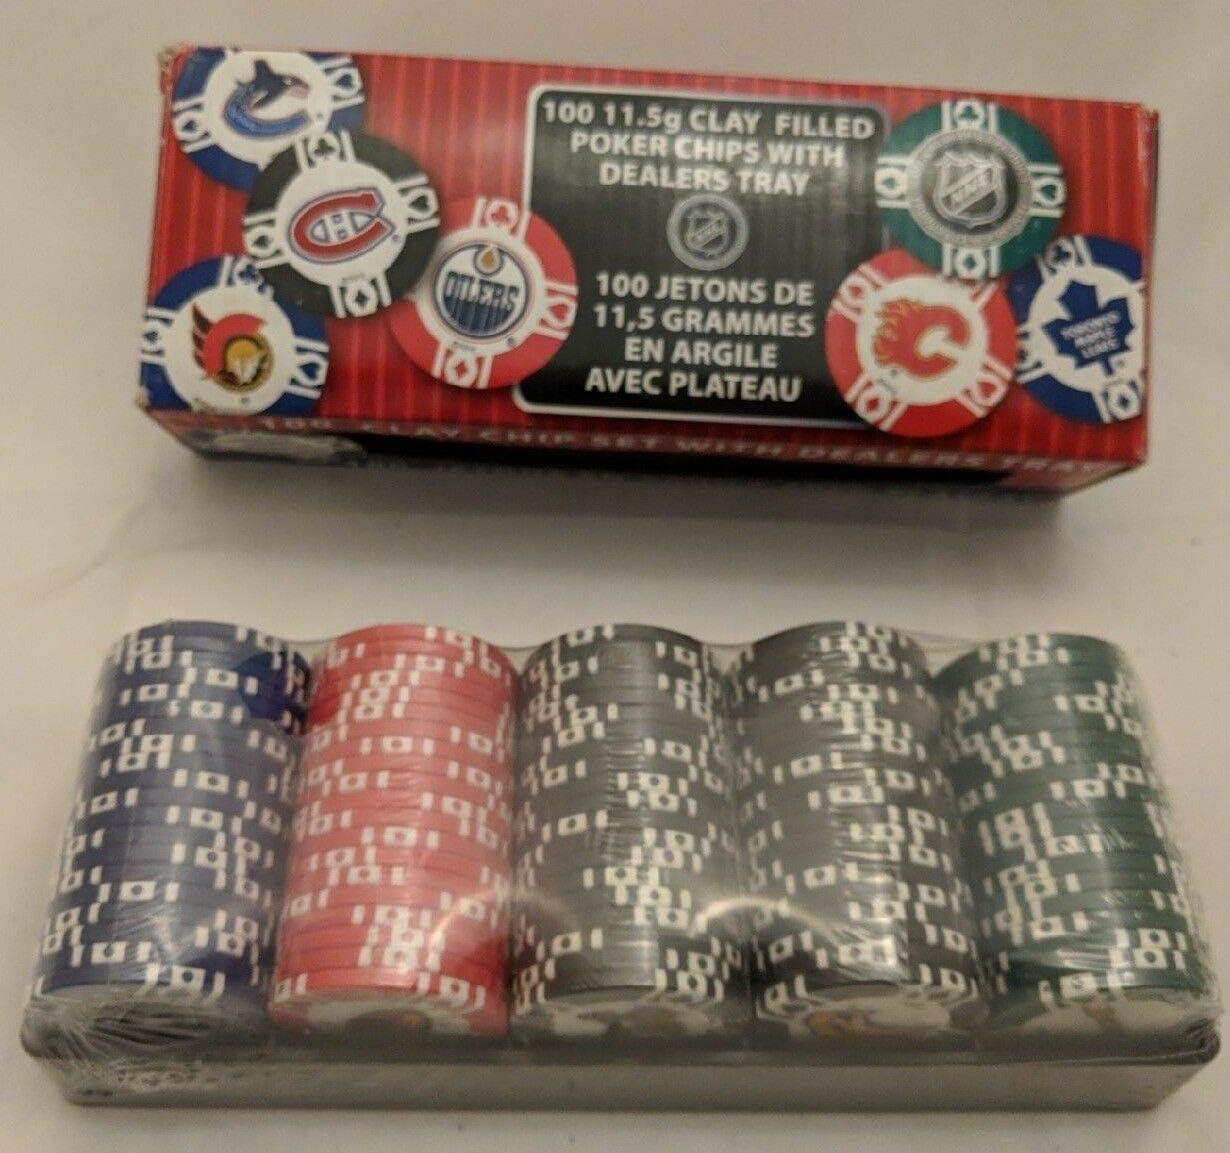 Bicycle - 100 Licensed NHL 11.5g OFFer Deale Poker Clay Bargain sale Chips Filled